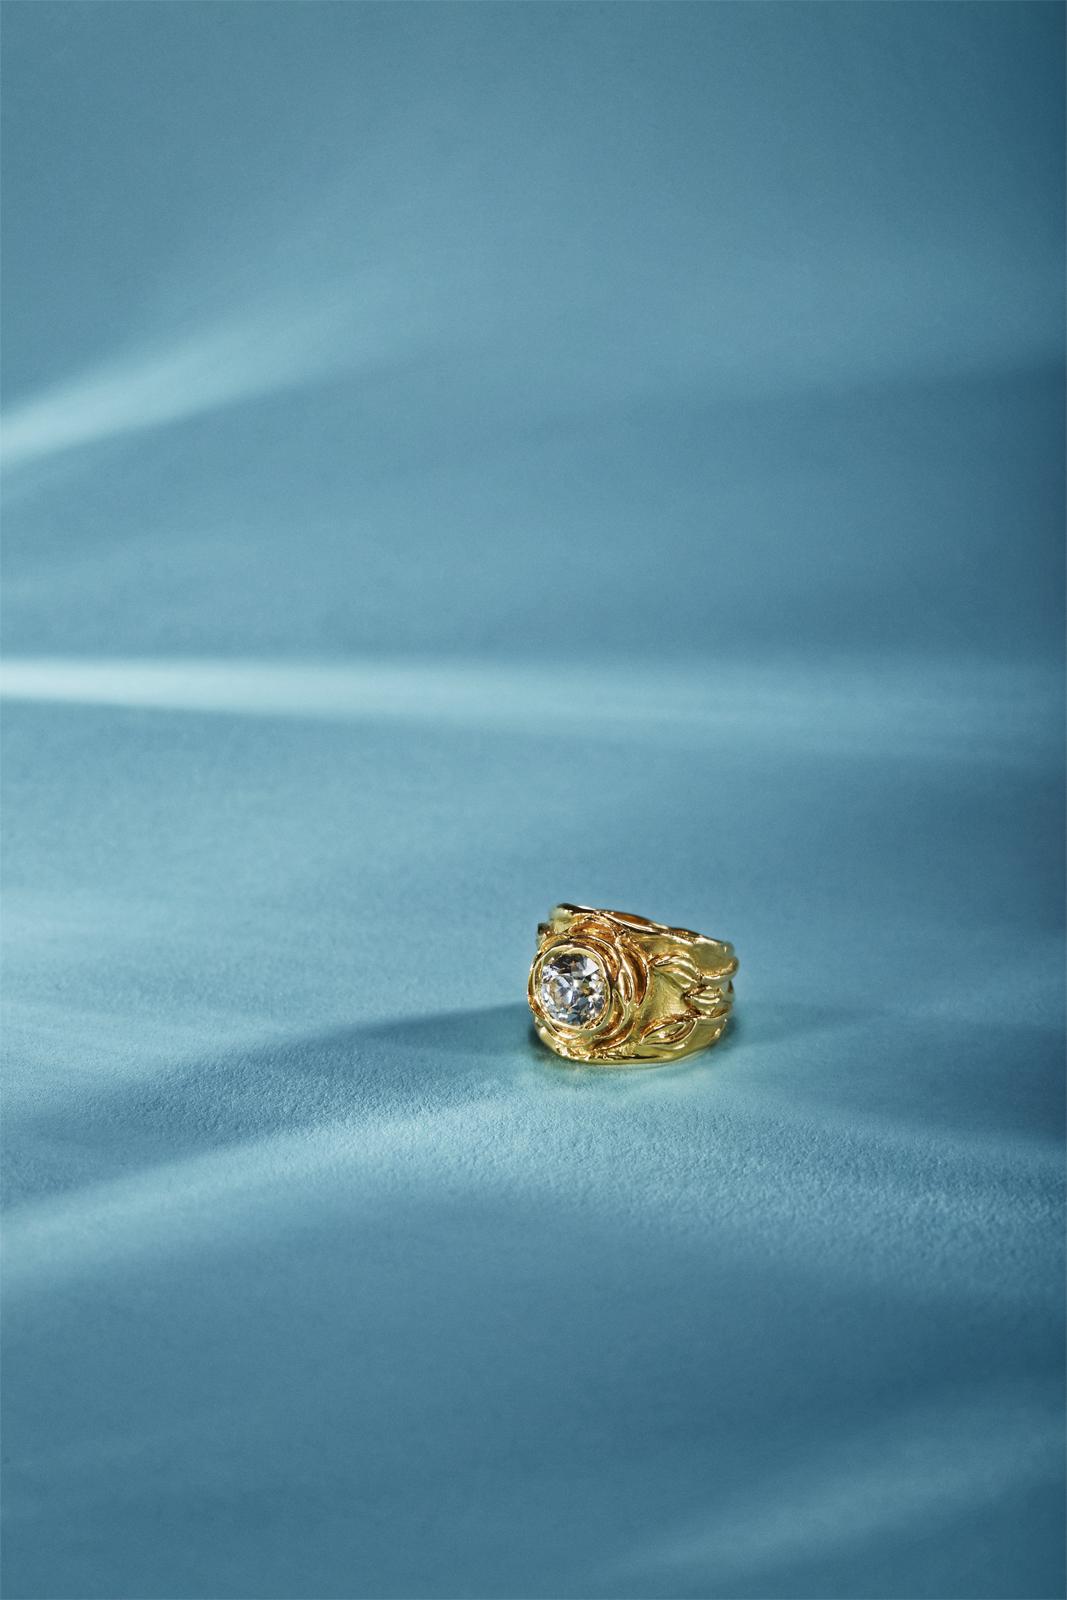 Distinctive Engagement Ring Designs – The Telegraph